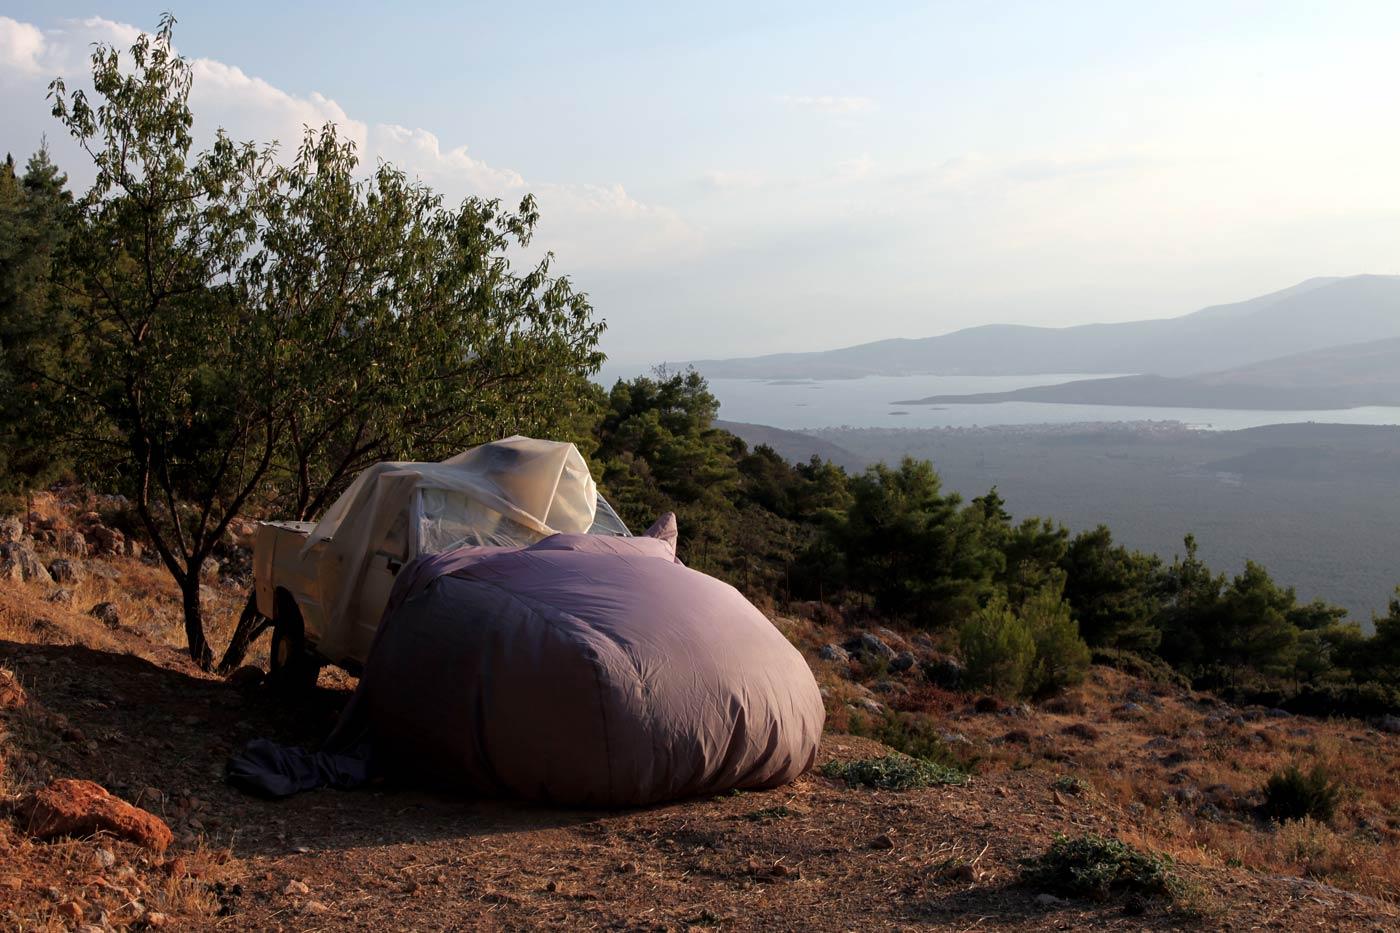 Covered car #2, Delphi, Greece